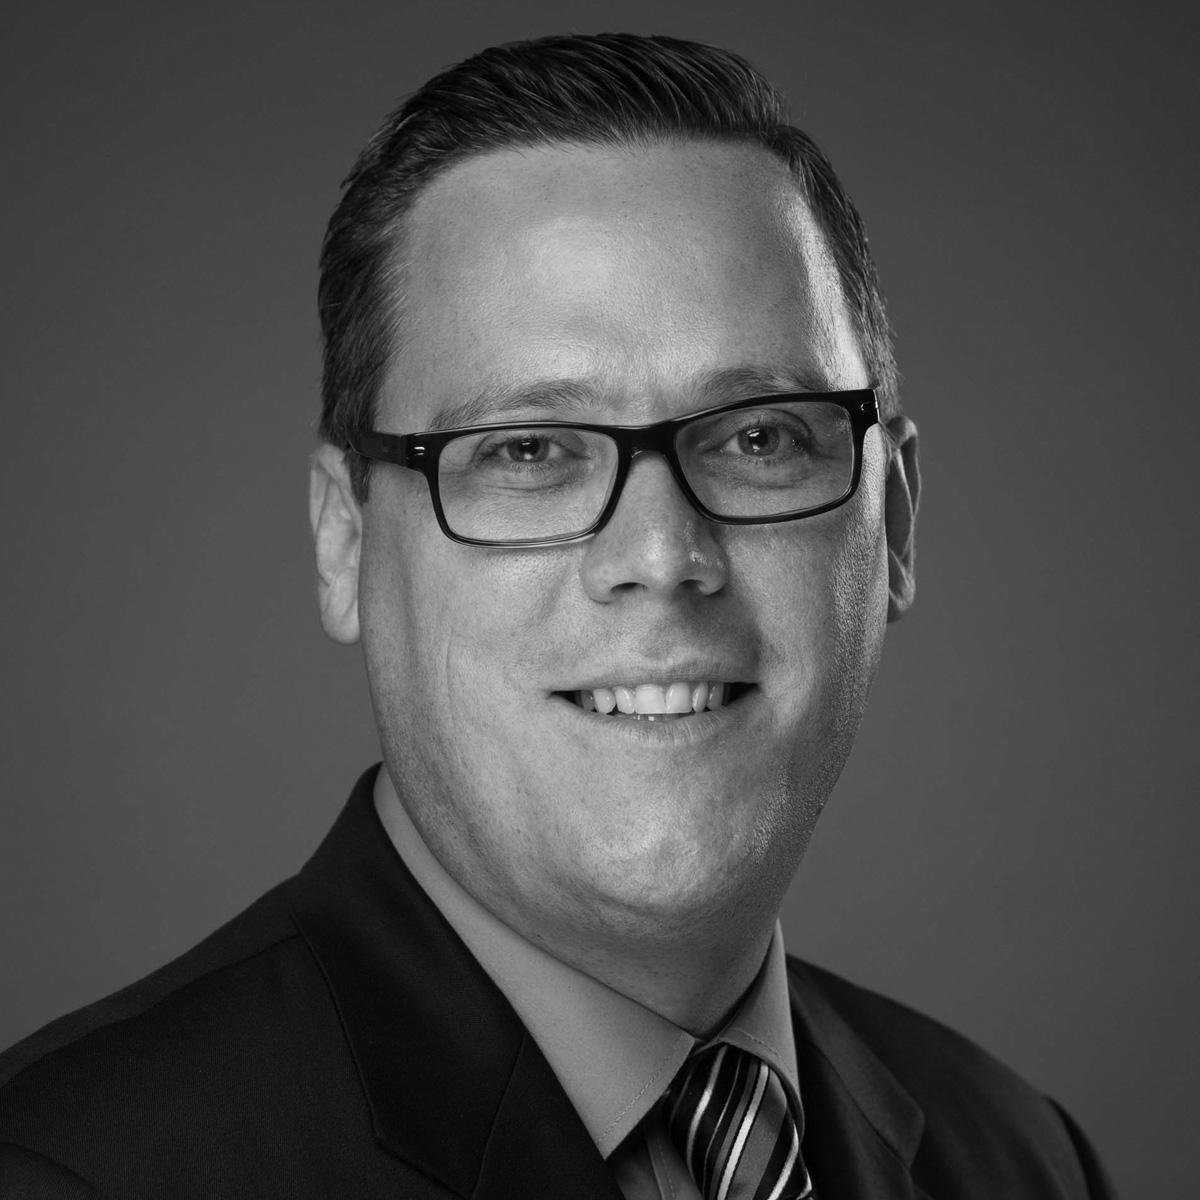 Michael R. Roush, MA, AFC